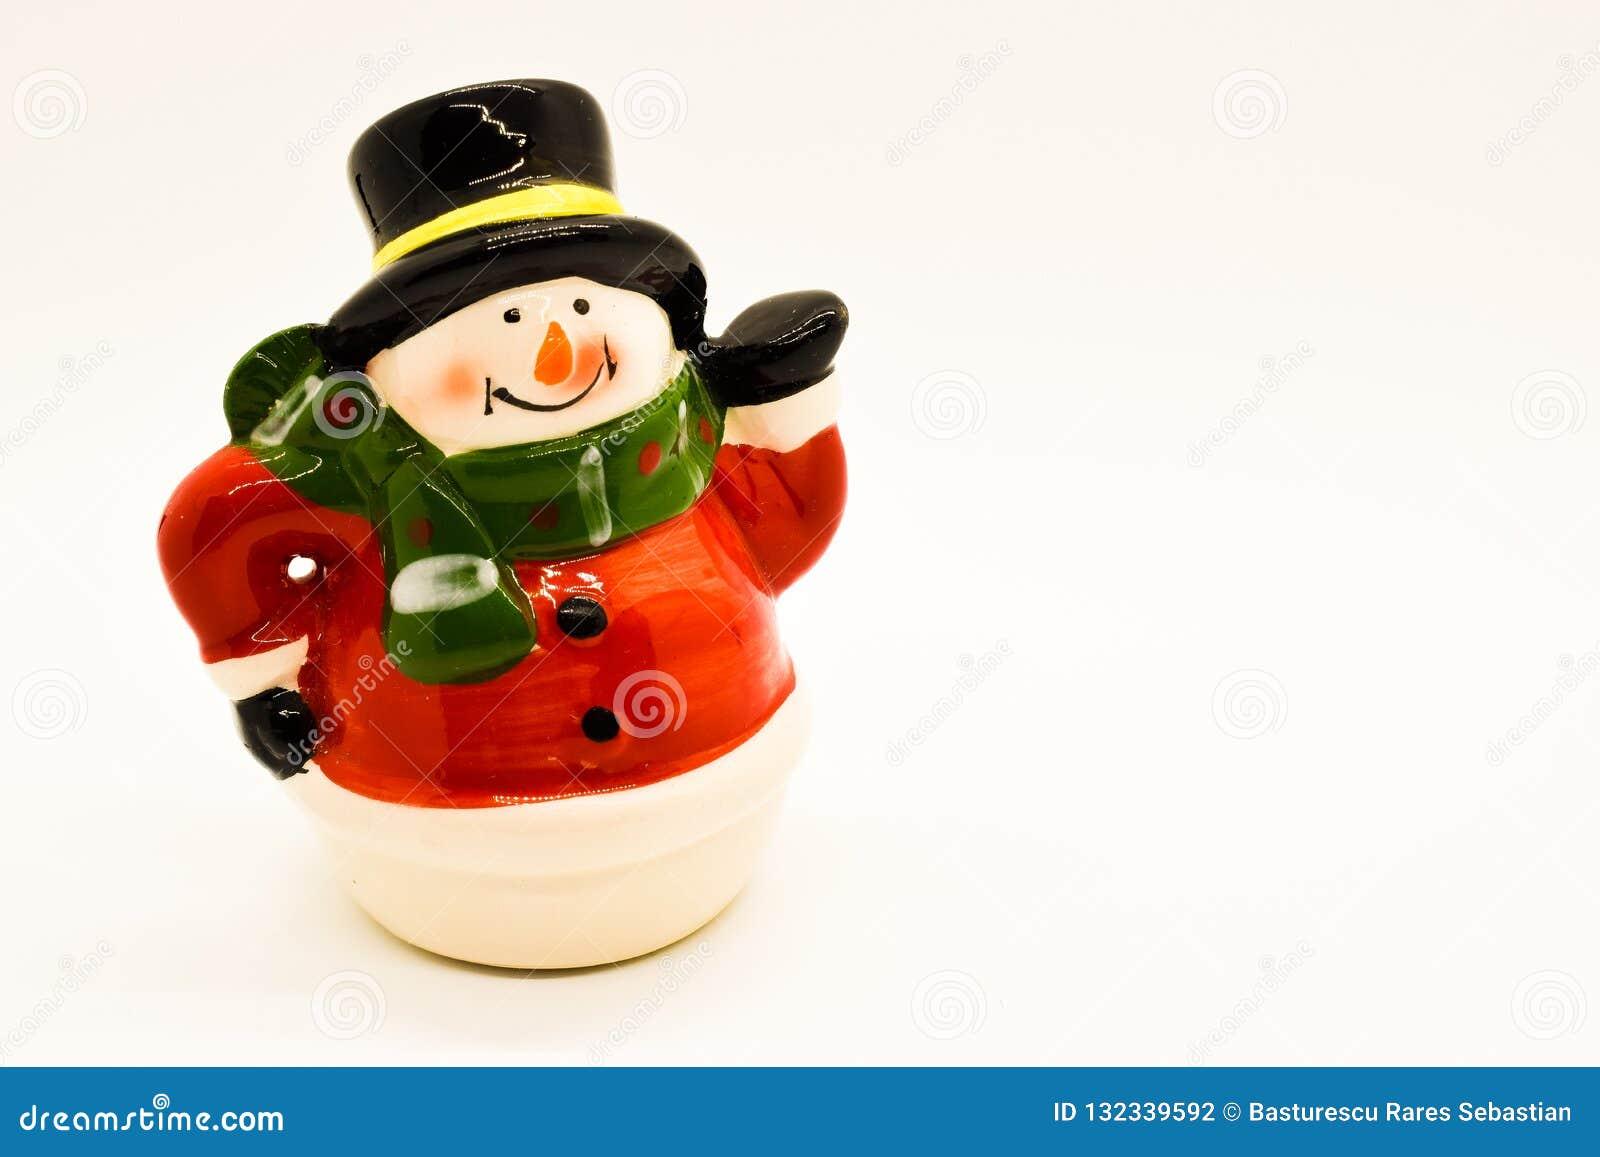 Handmade snowman figurine isolated on white background. Christmas decoration.